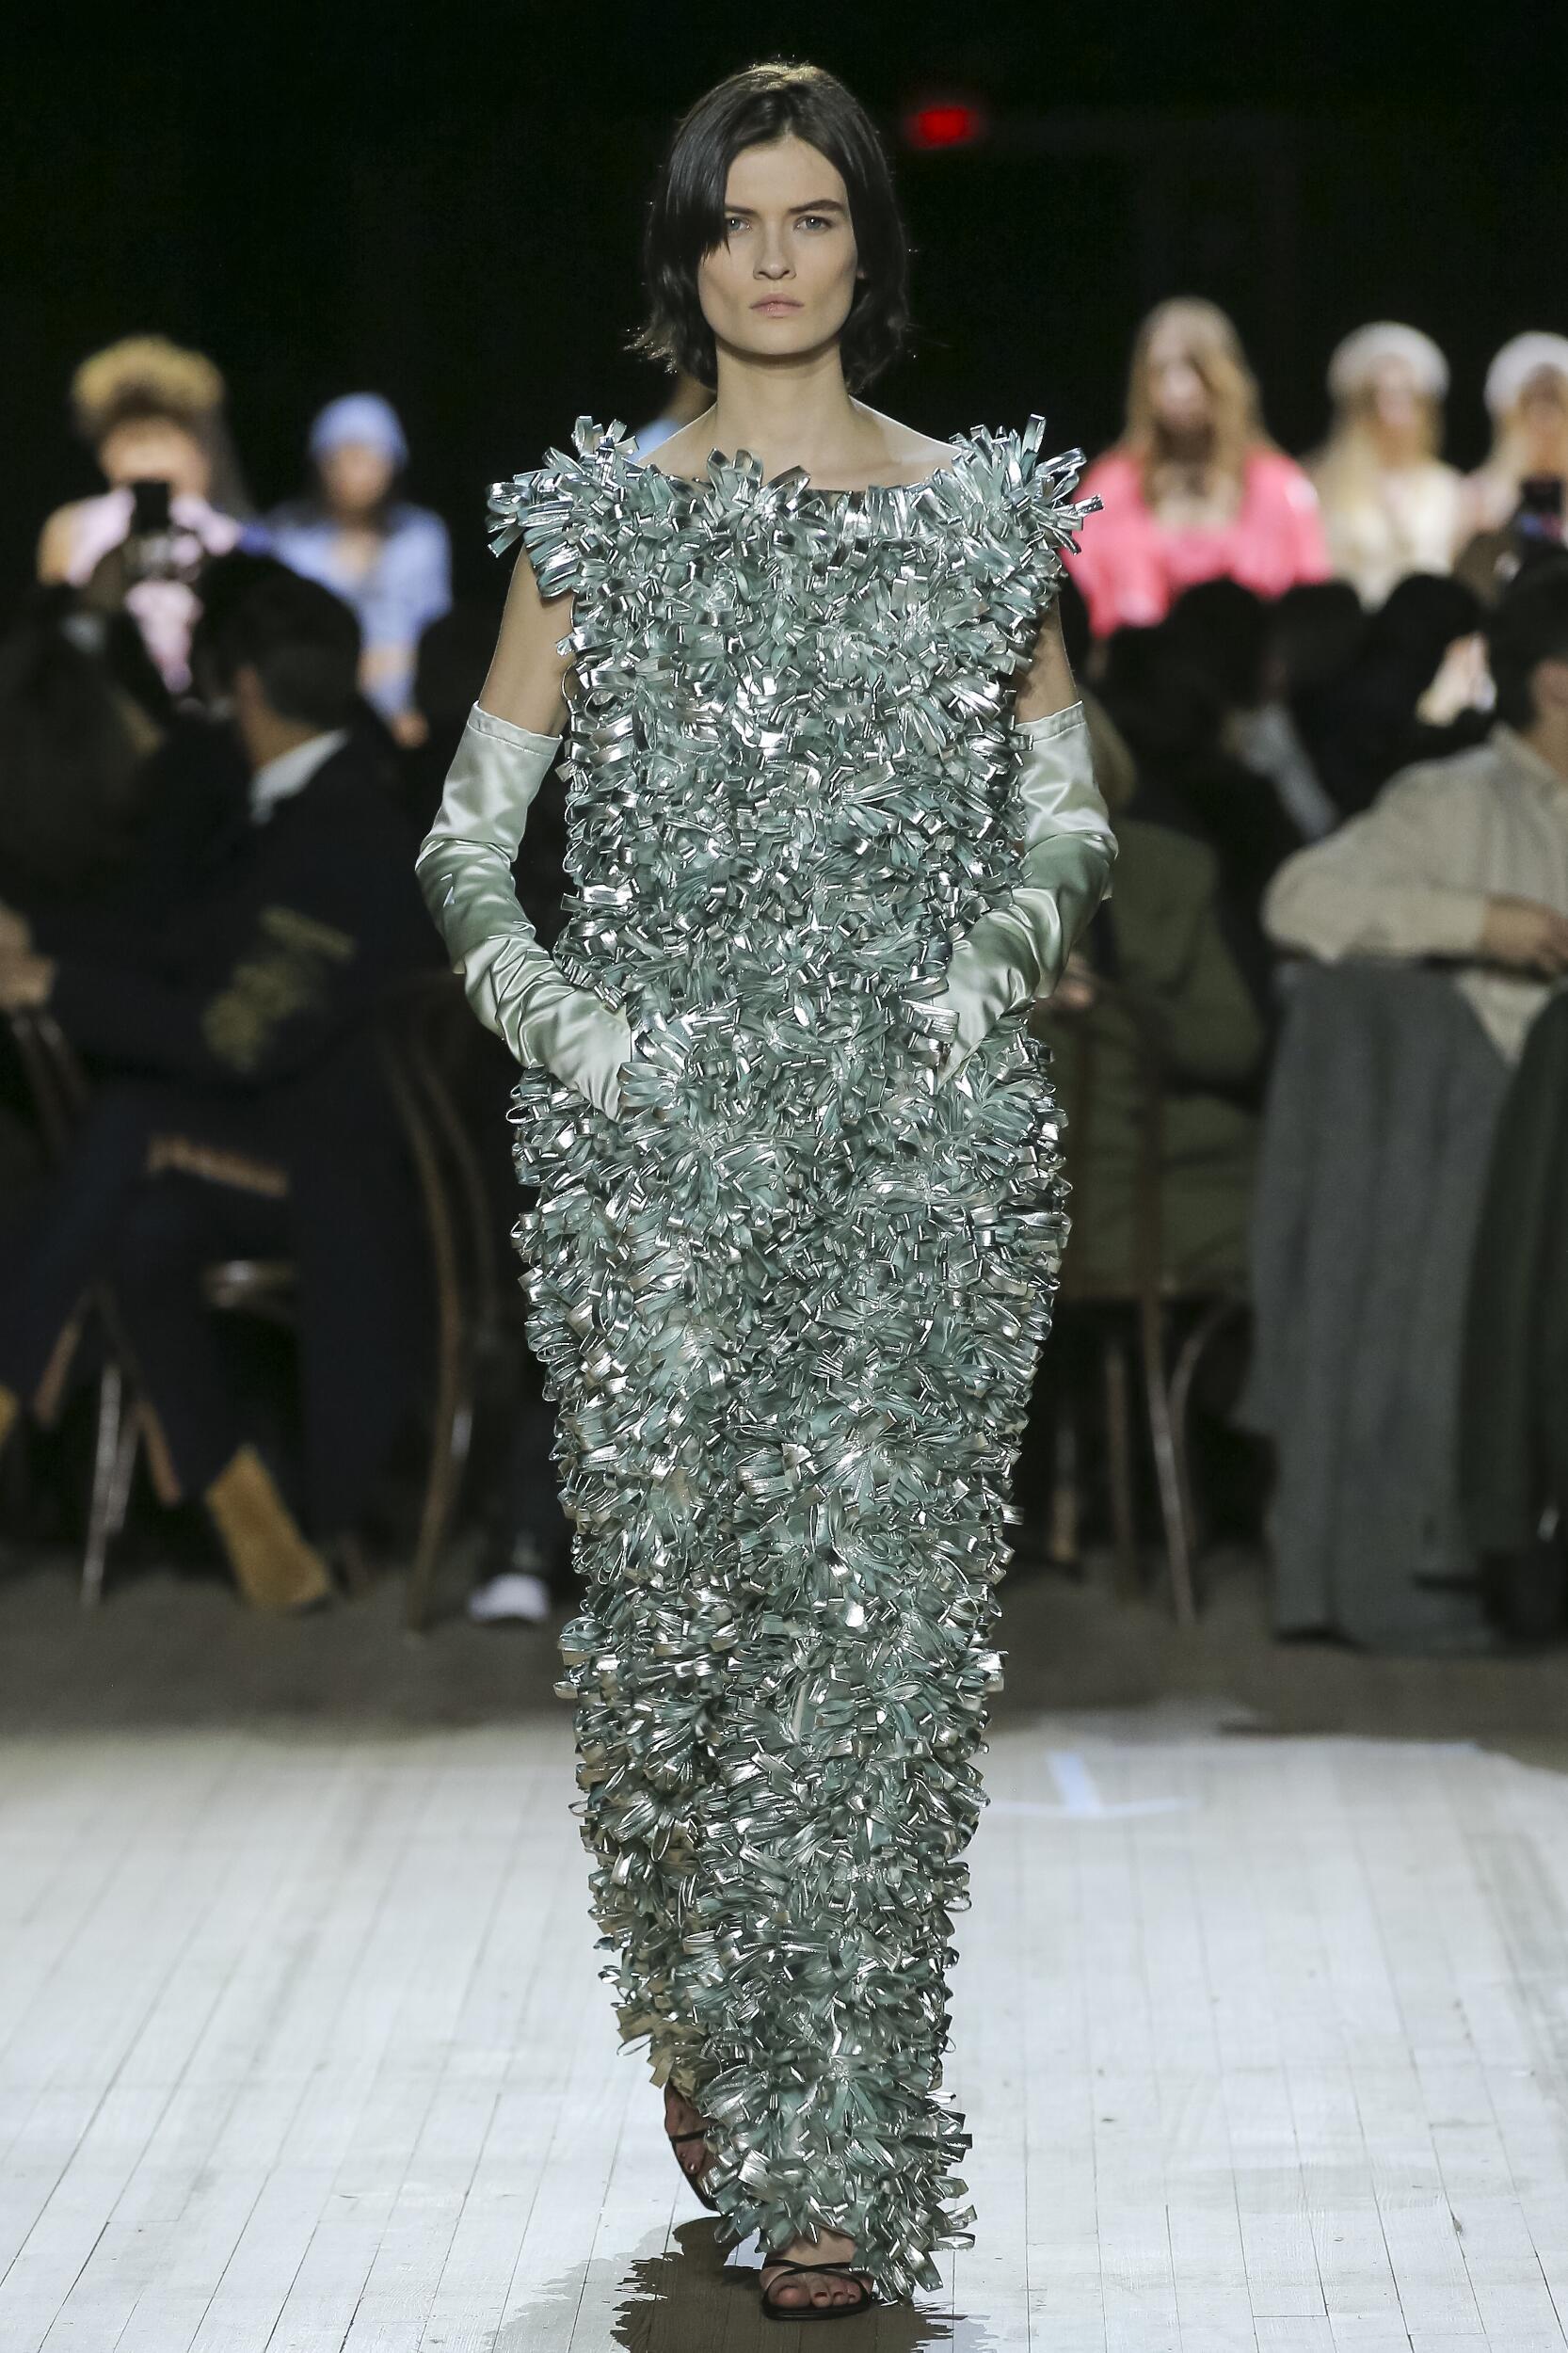 Woman FW 2020 Marc Jacobs Show New York Fashion Week